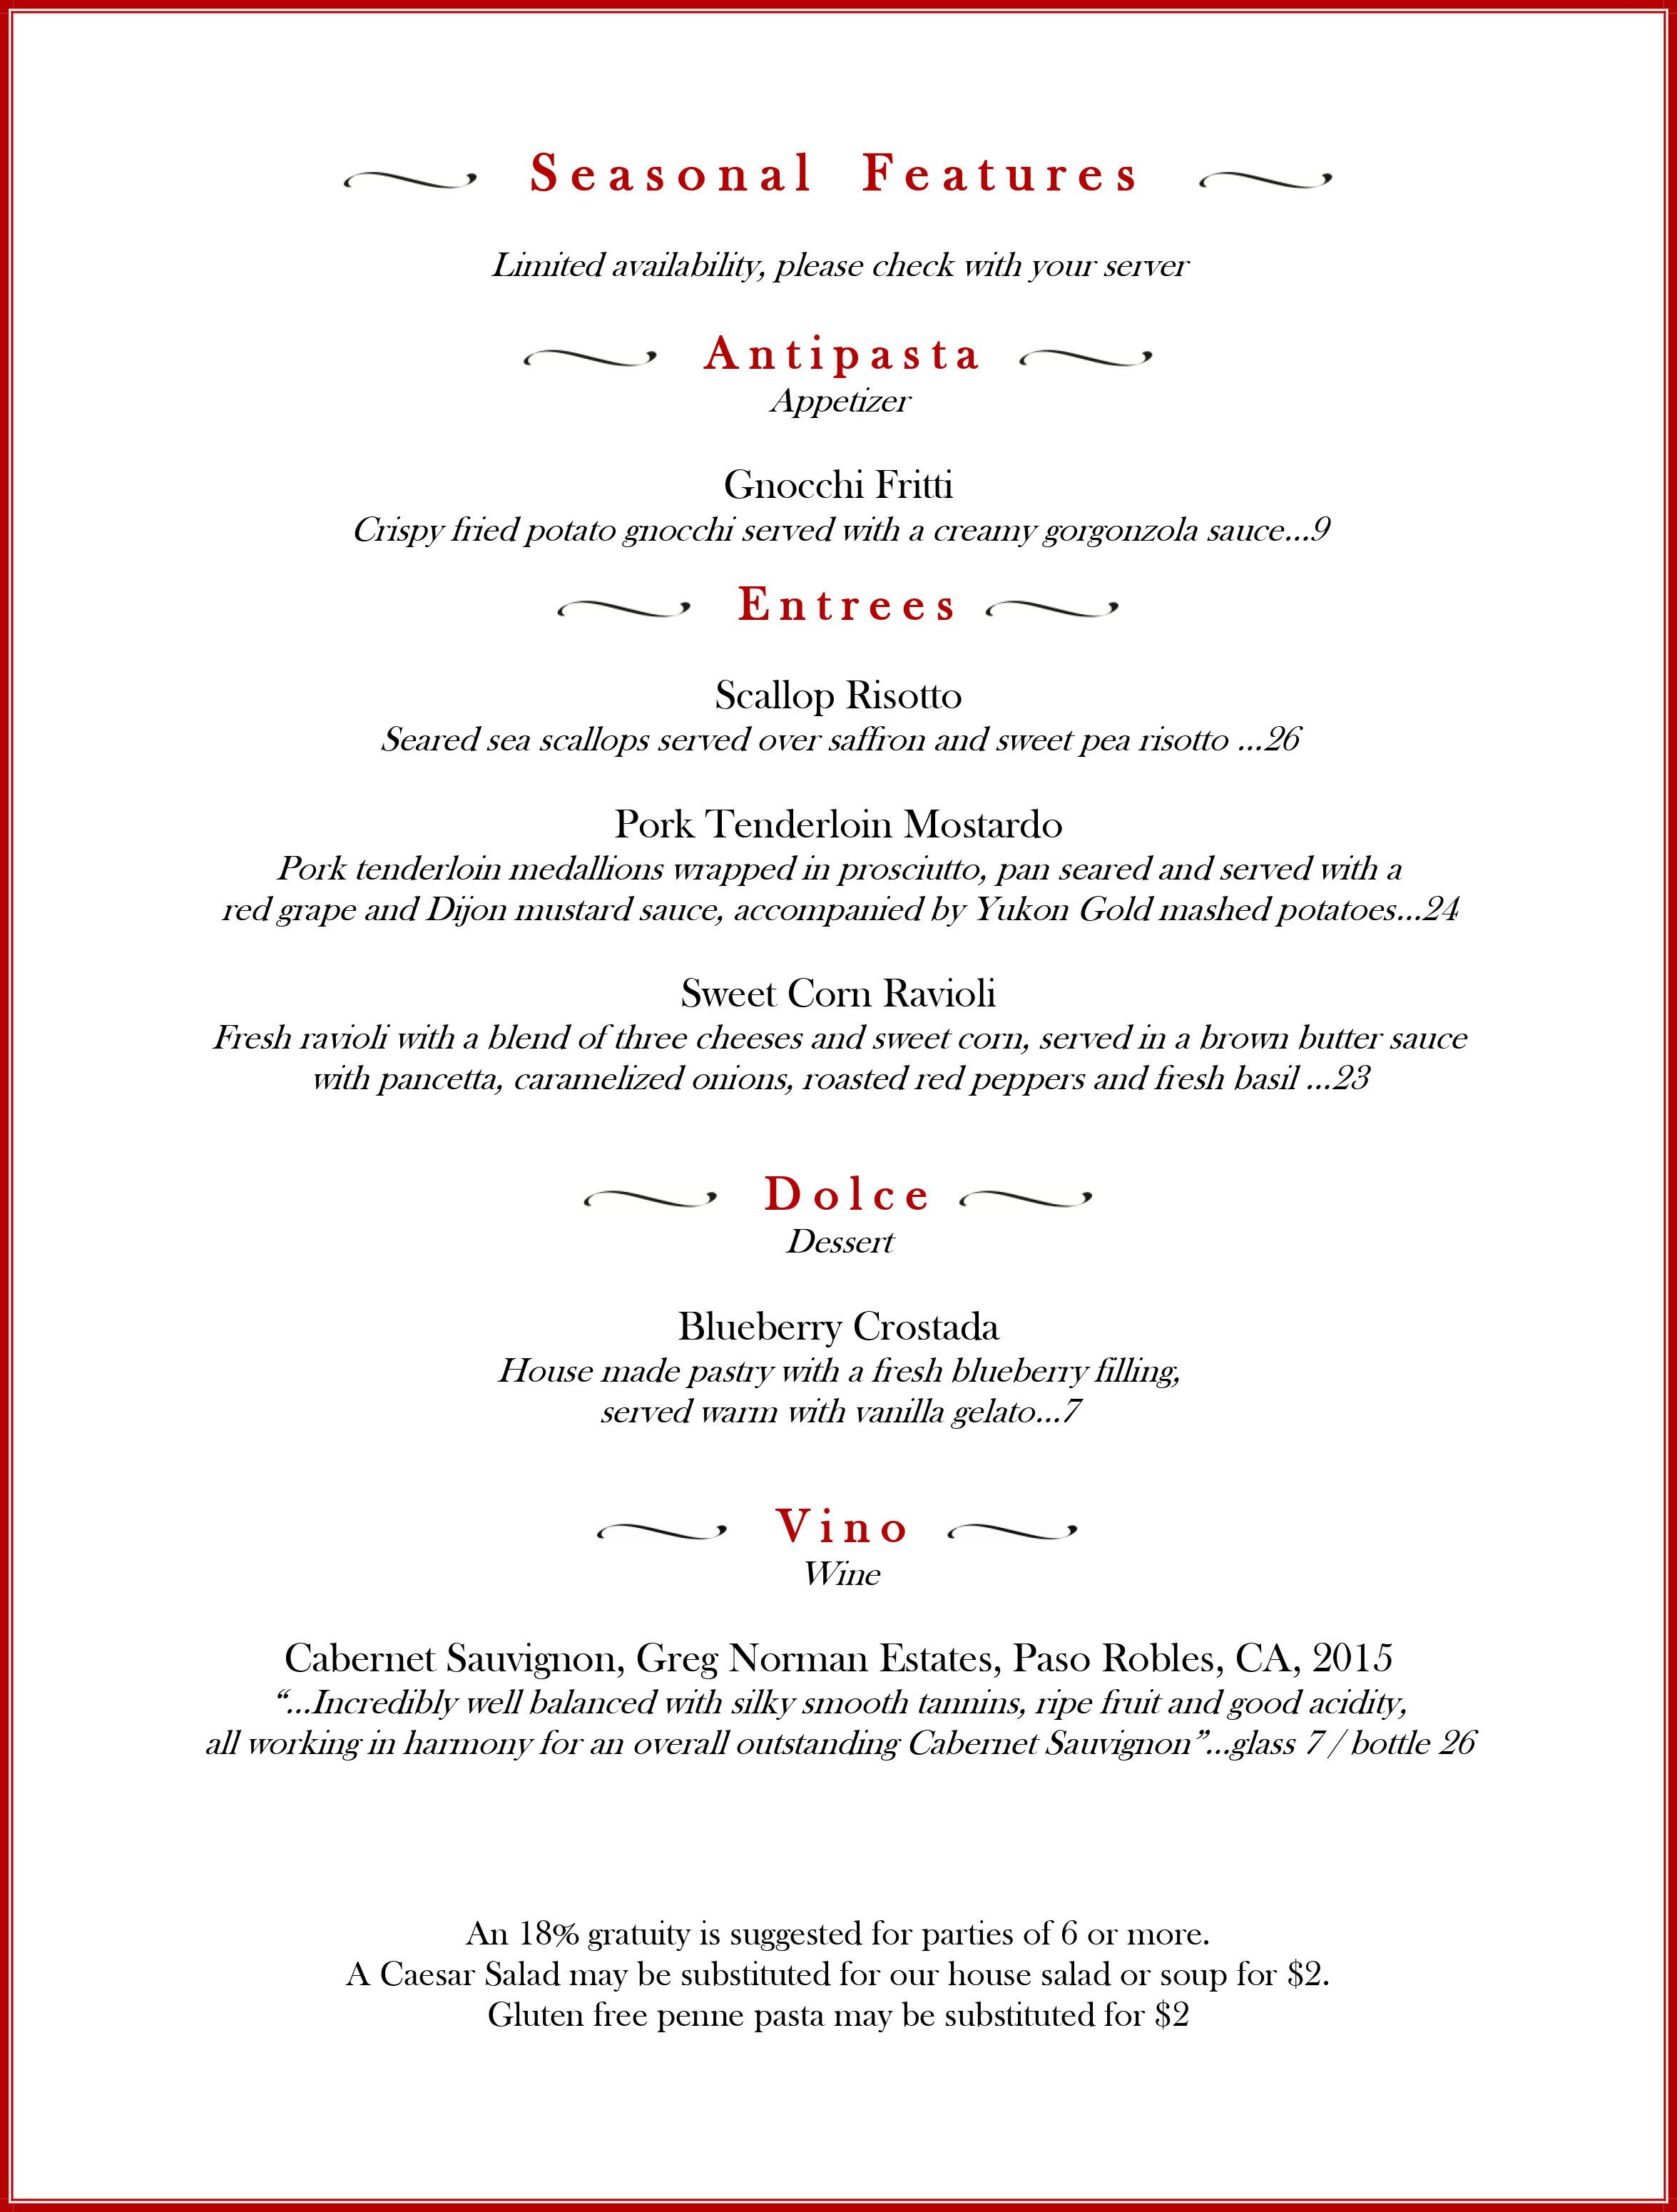 specials, features, positano's, positanos, palm harbor, italian food, new menu, June